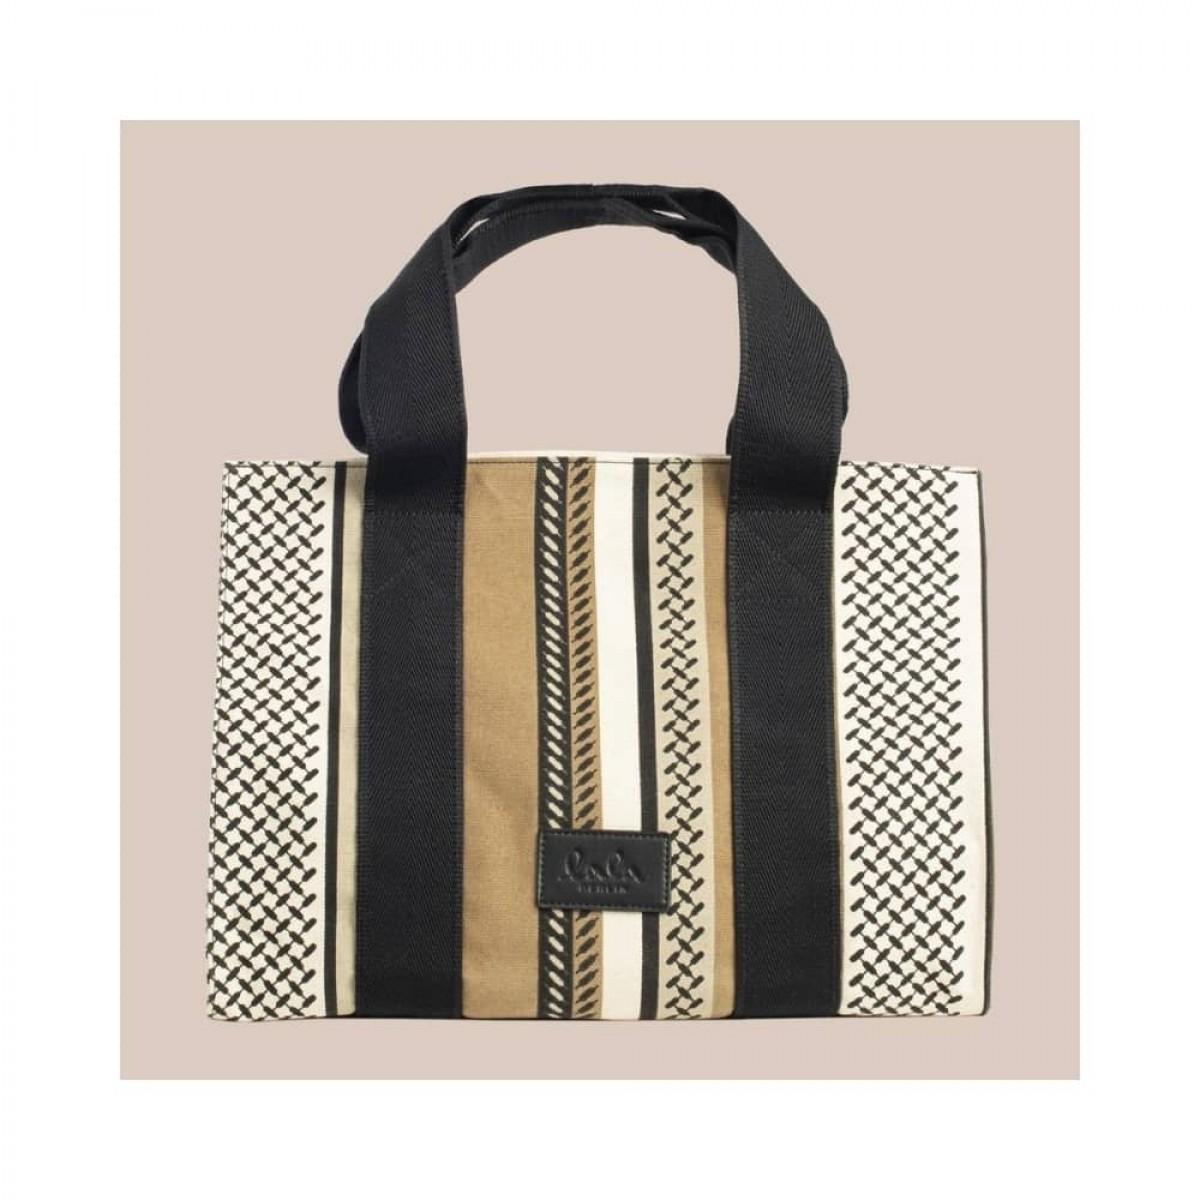 big tote josie bag - kufiya hessian dune - front